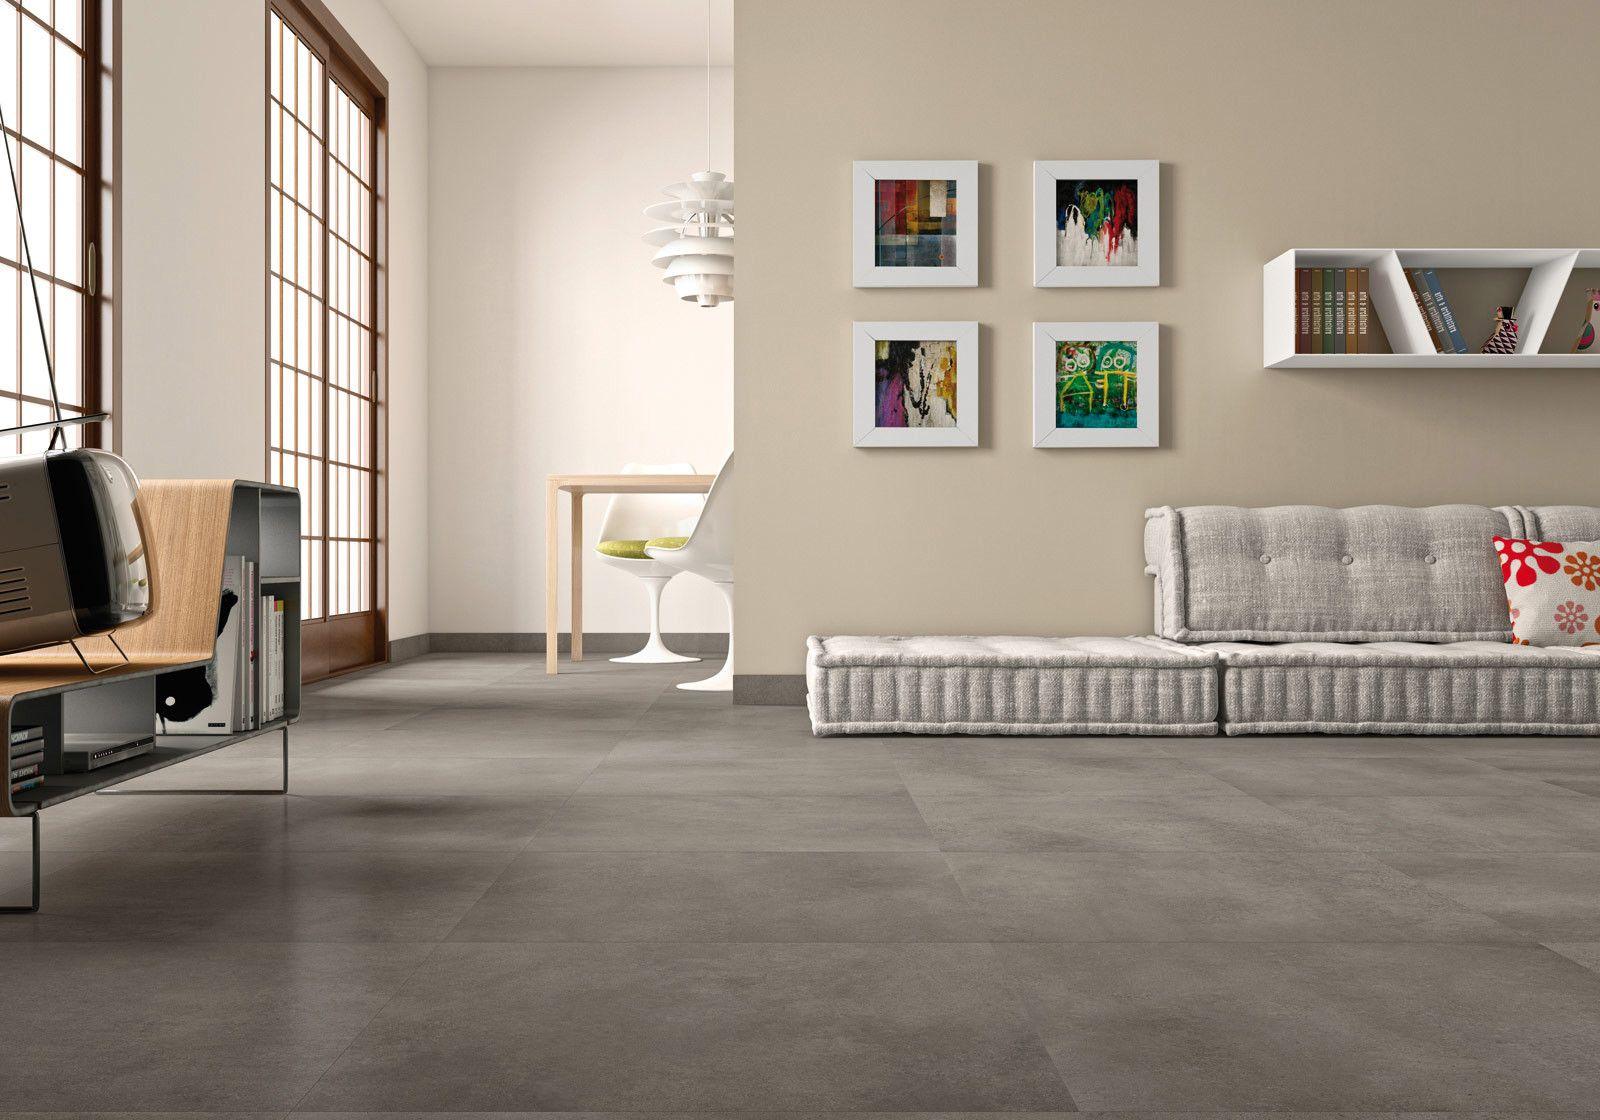 Marazzi #Denver Grey 60x60 cm DAY8 | #Feinsteinzeug #Steinoptik ...